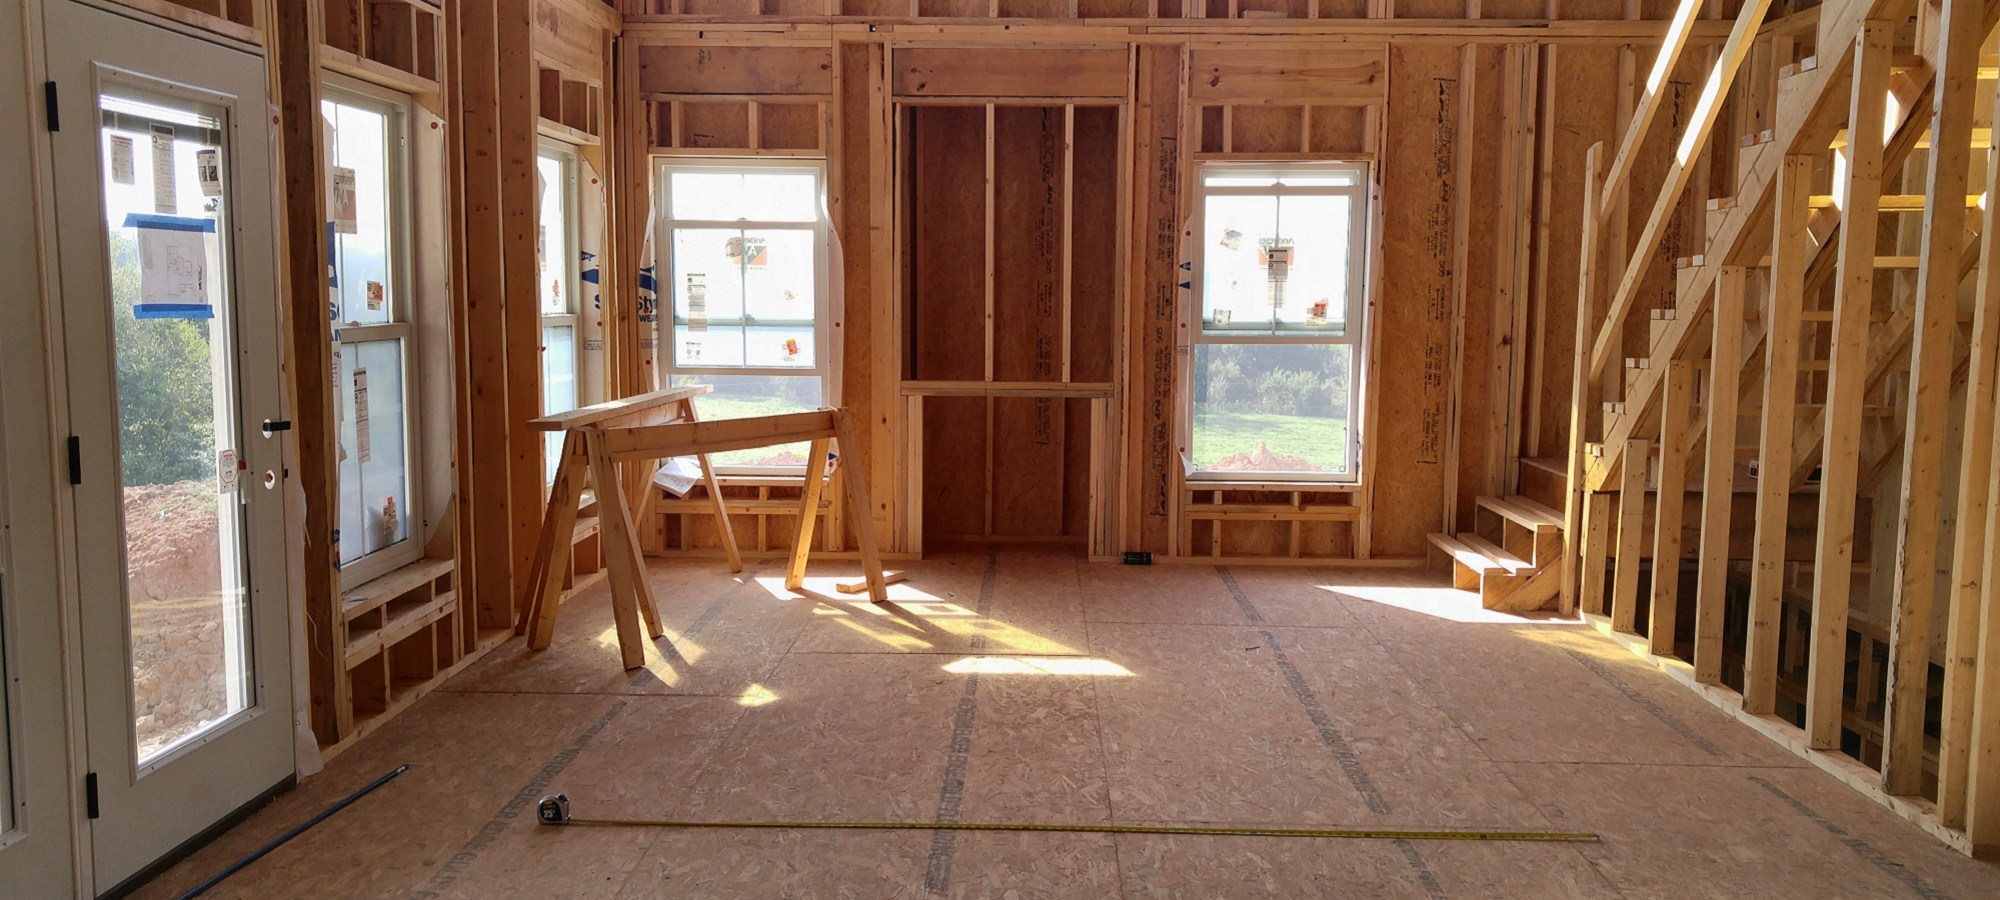 custom house interior framing